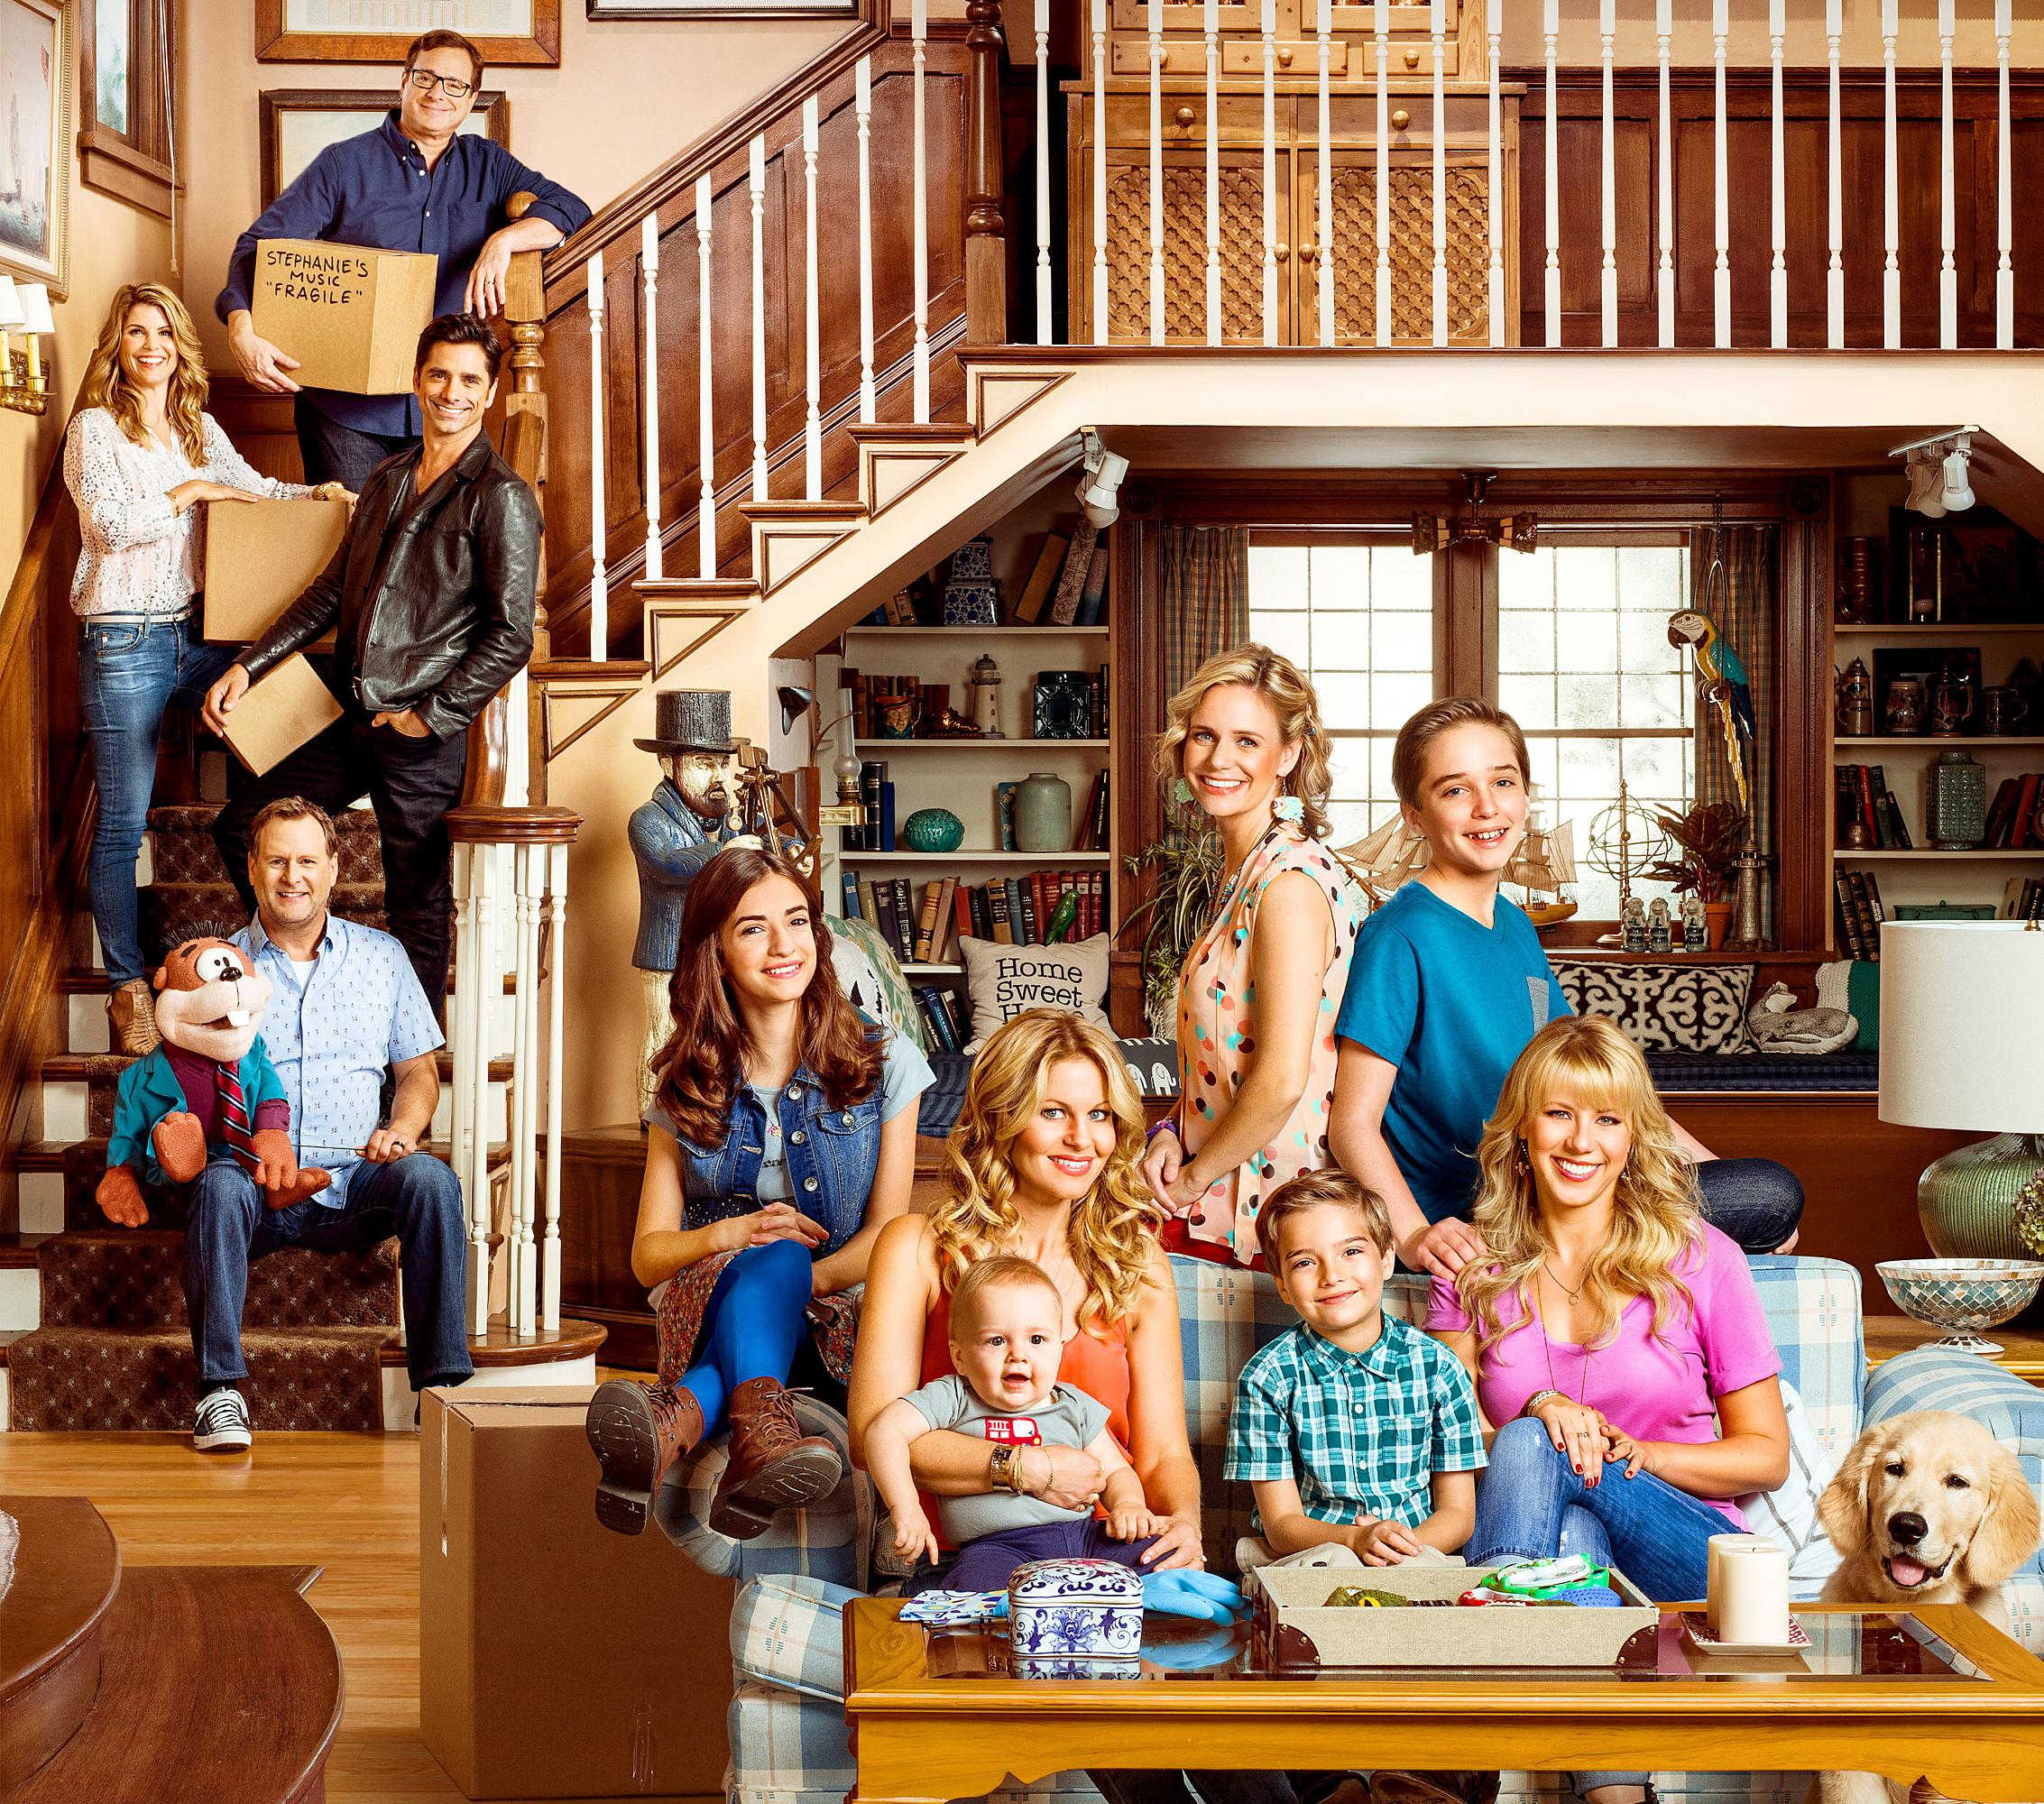 'Fuller House' Premiere Recap: The Gang Reunites, D.J. Flirts